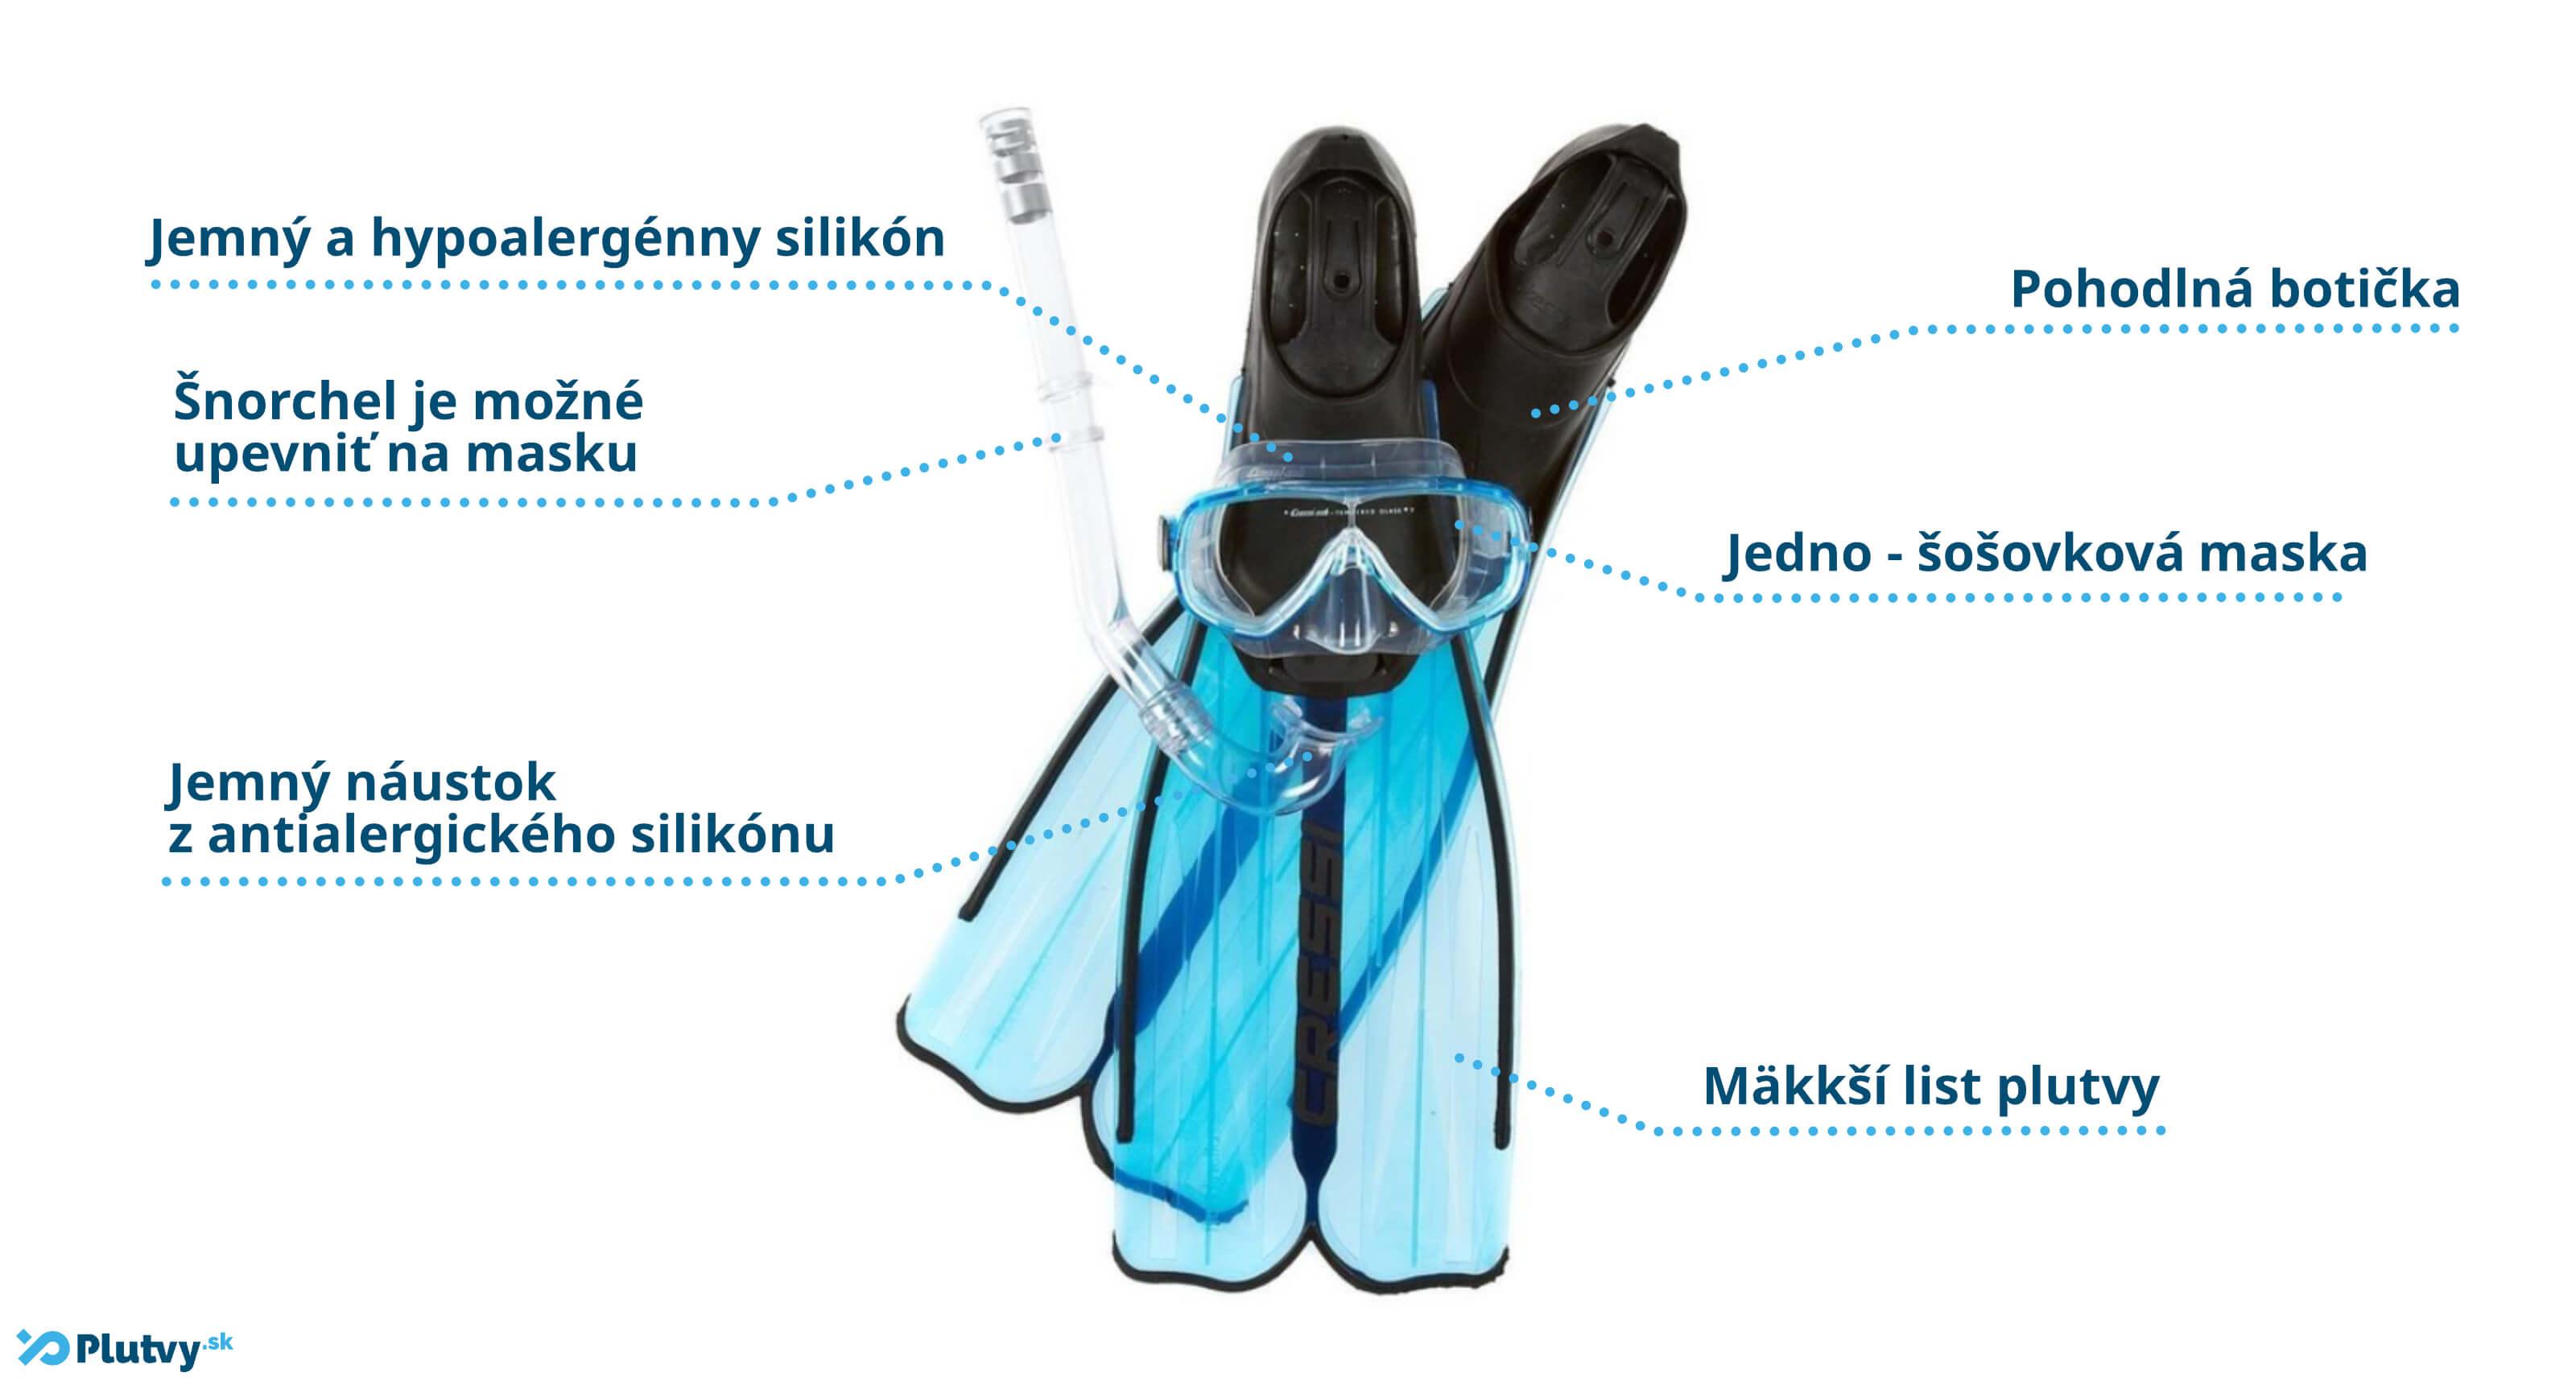 hlavne-vyhody-rondinella-bag-junior-snorchlovaci-set-plutvy-sk